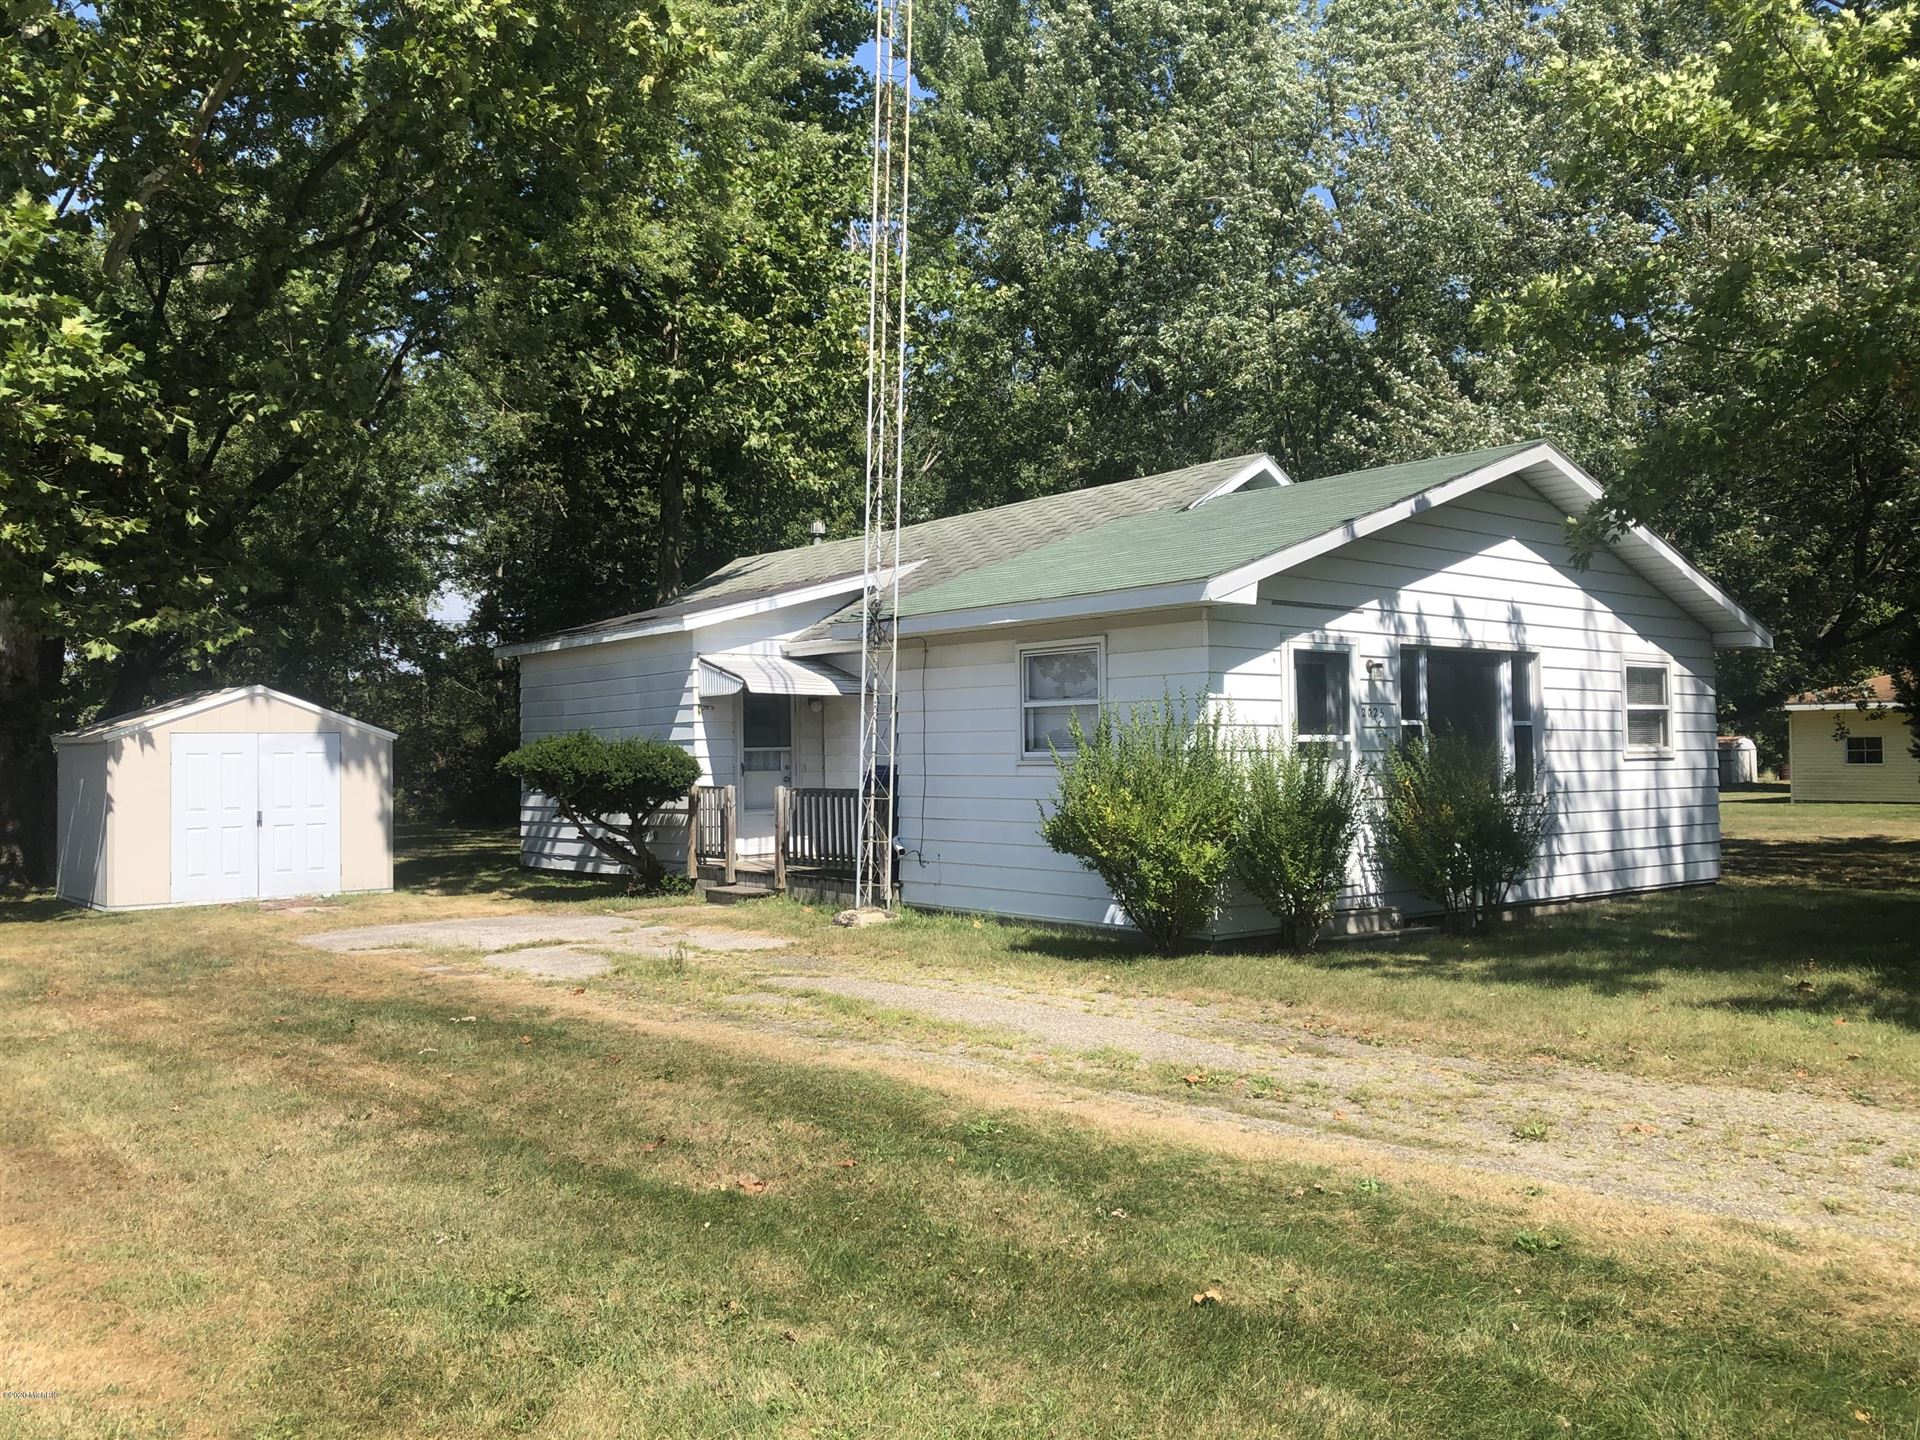 2025 Gaines Drive, Benton Harbor, MI 49022 - MLS#: 20035790